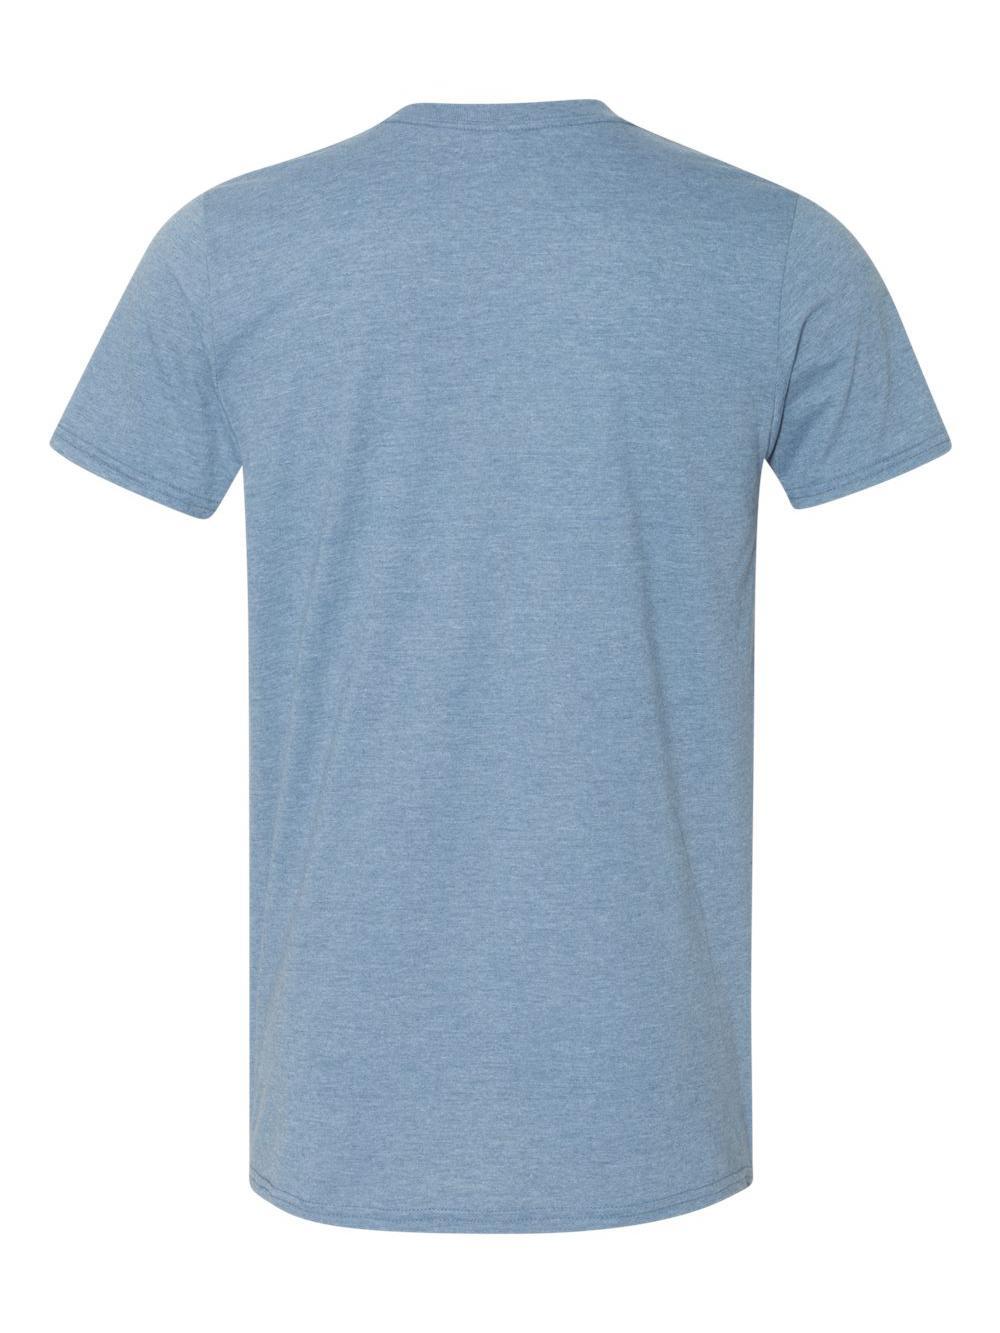 Gildan-Softstyle-T-Shirt-64000 thumbnail 70